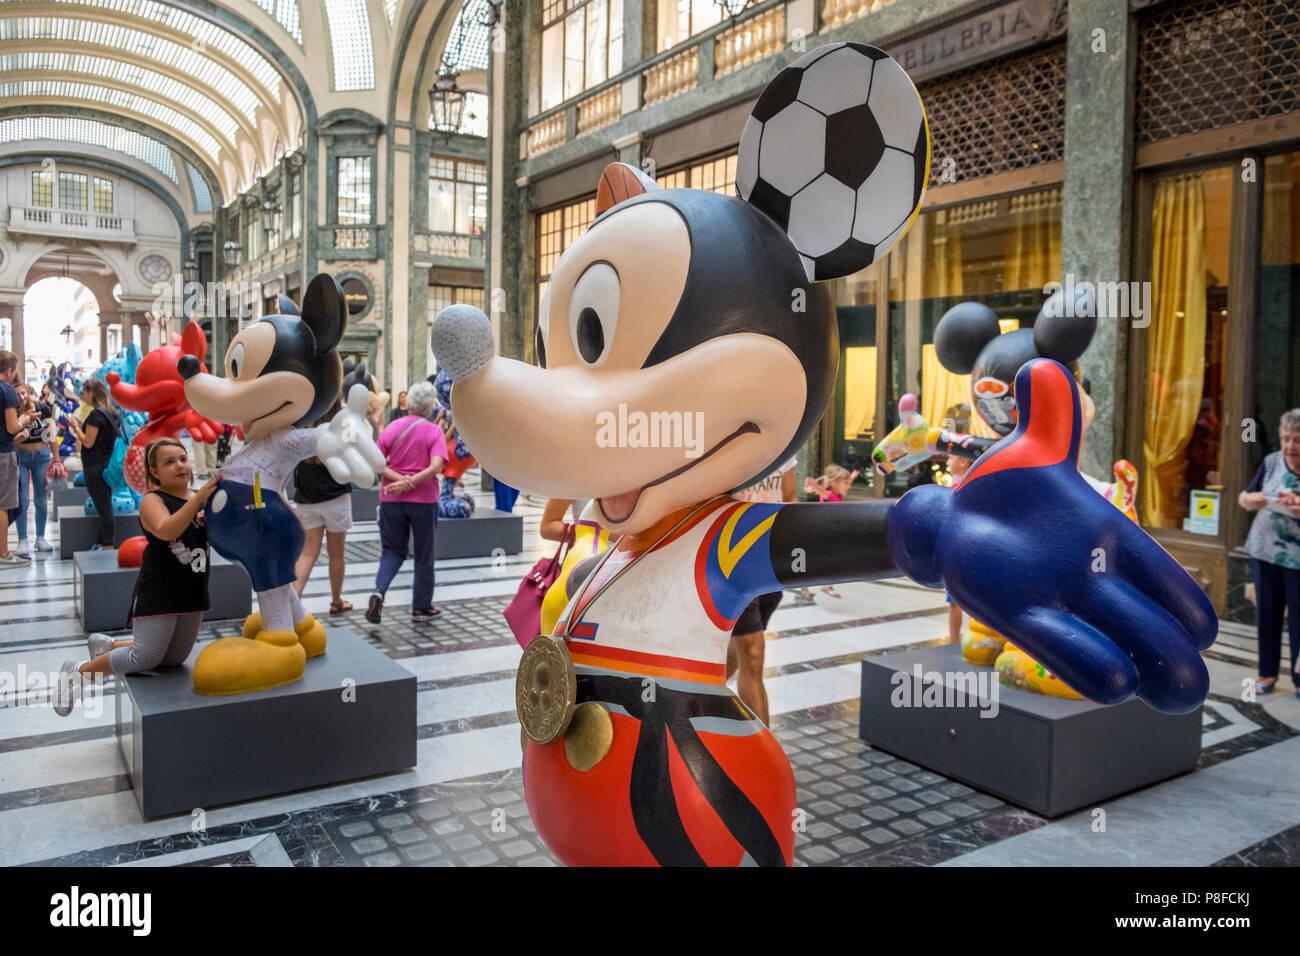 Mickey Mouse Cartoon Stock Photos Amp Mickey Mouse Cartoon